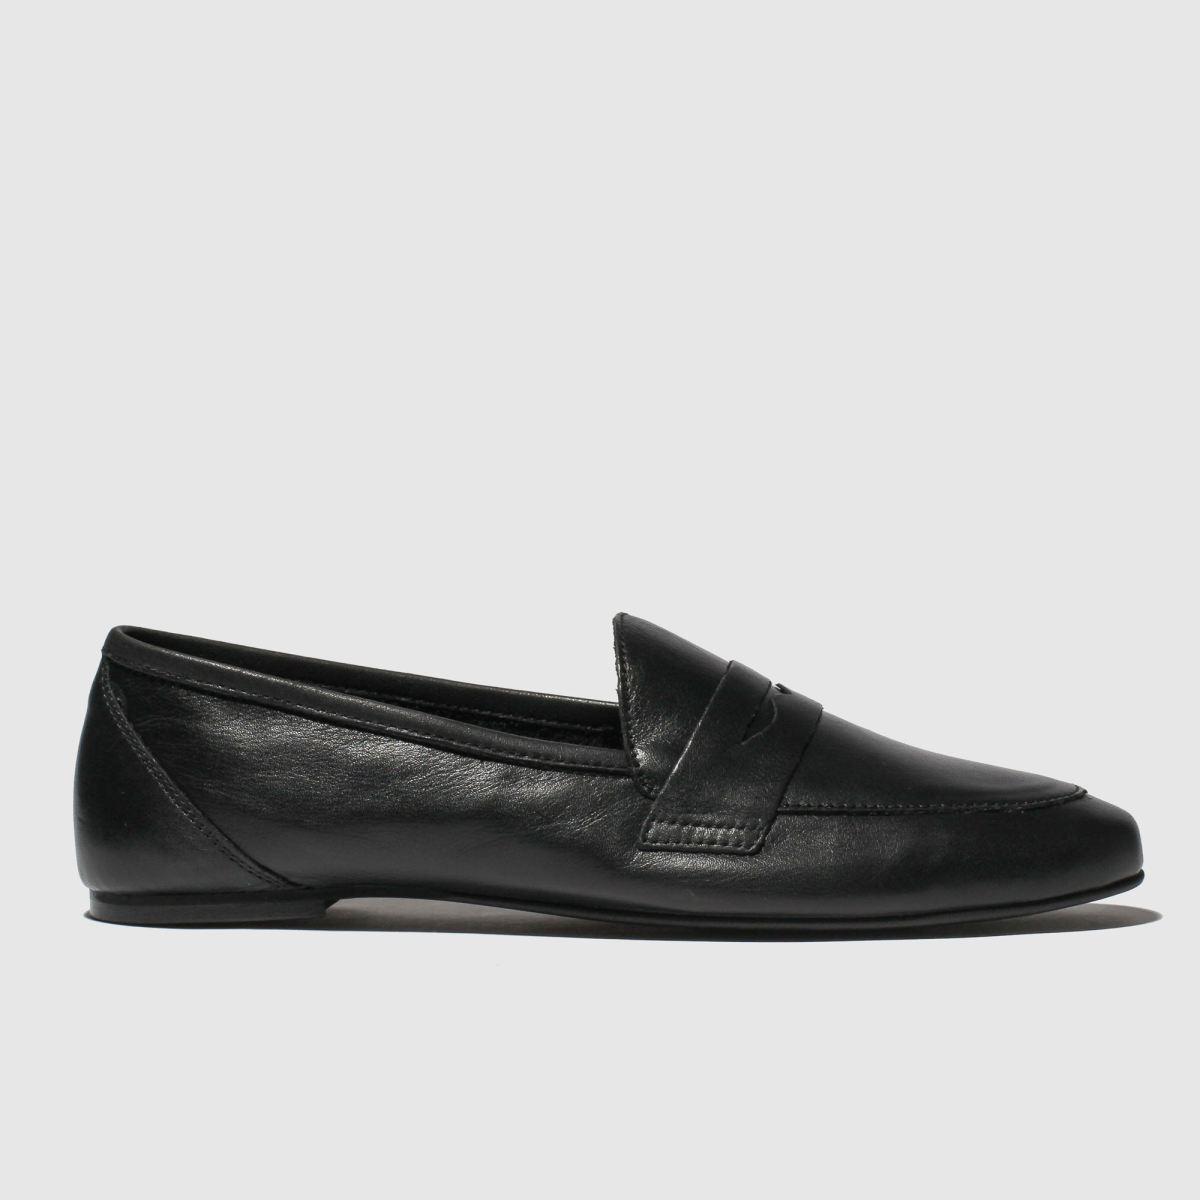 schuh Schuh Black Impact Flat Shoes